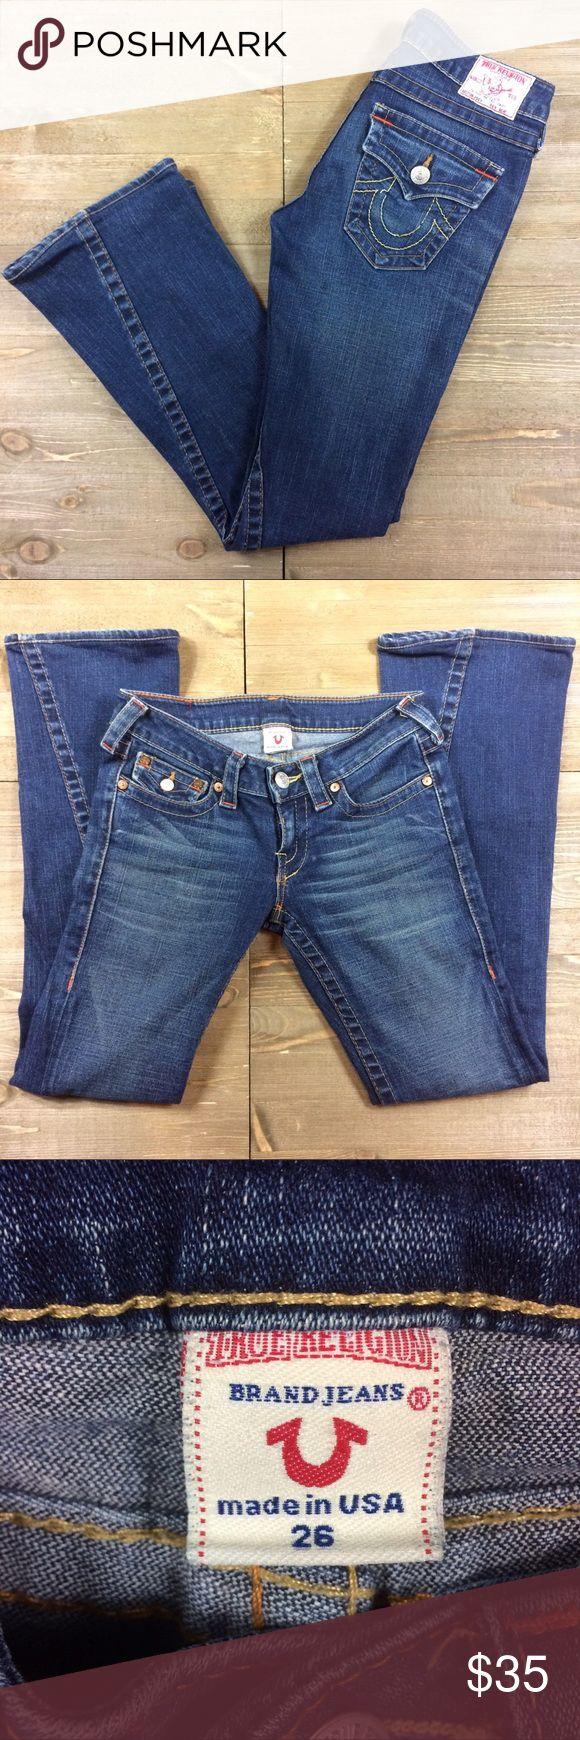 True Religion Jeans Size 26 dark wash True Religion jeans. Button closure on the back pockets. True Religion Jeans Flare & Wide Leg